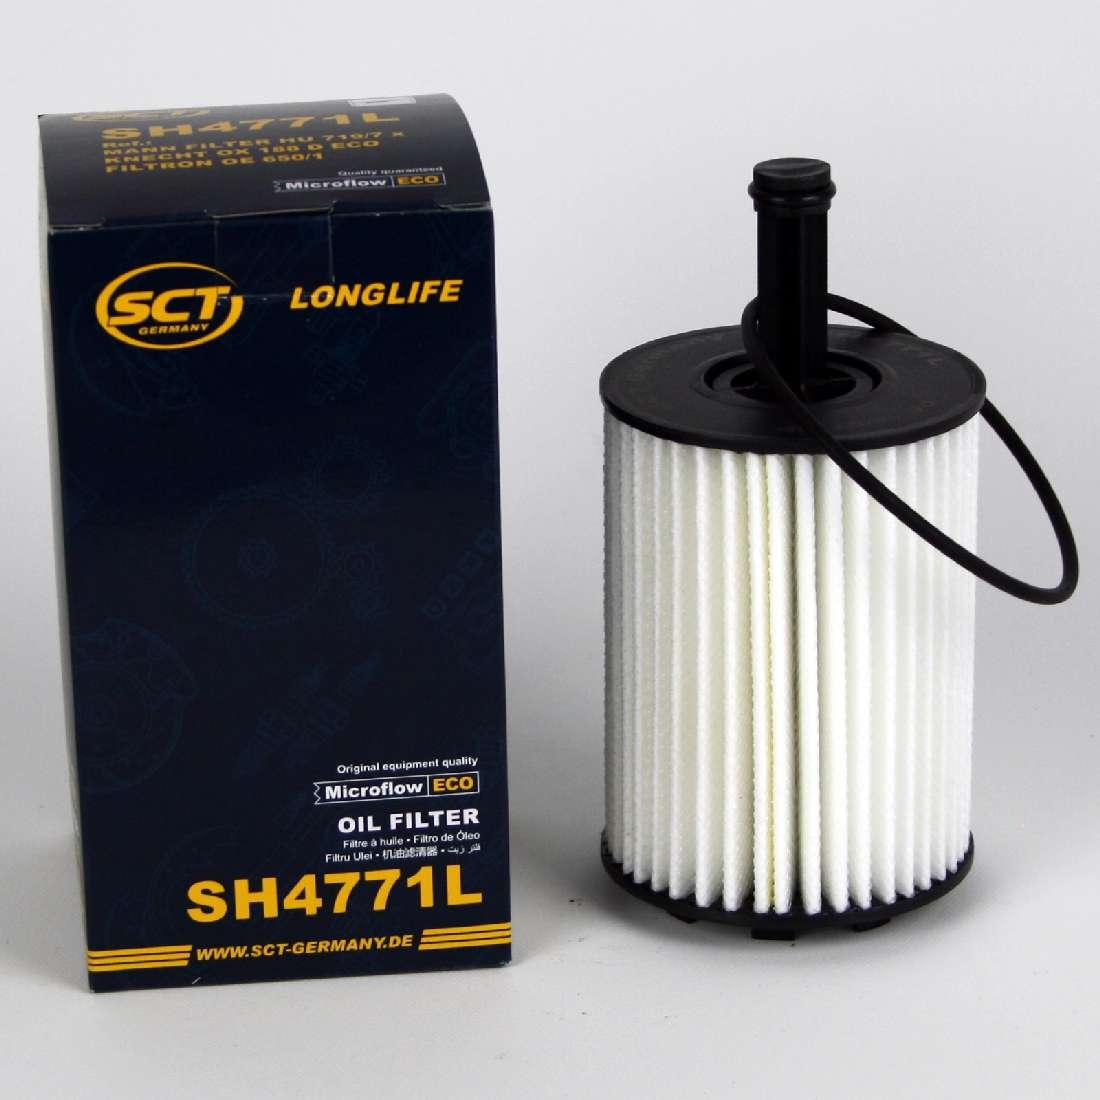 Ölablassschraube SH4771L VAG 1,9 /& 2,0TDI SCT Ölfilter Longlife-Ölfilter inkl